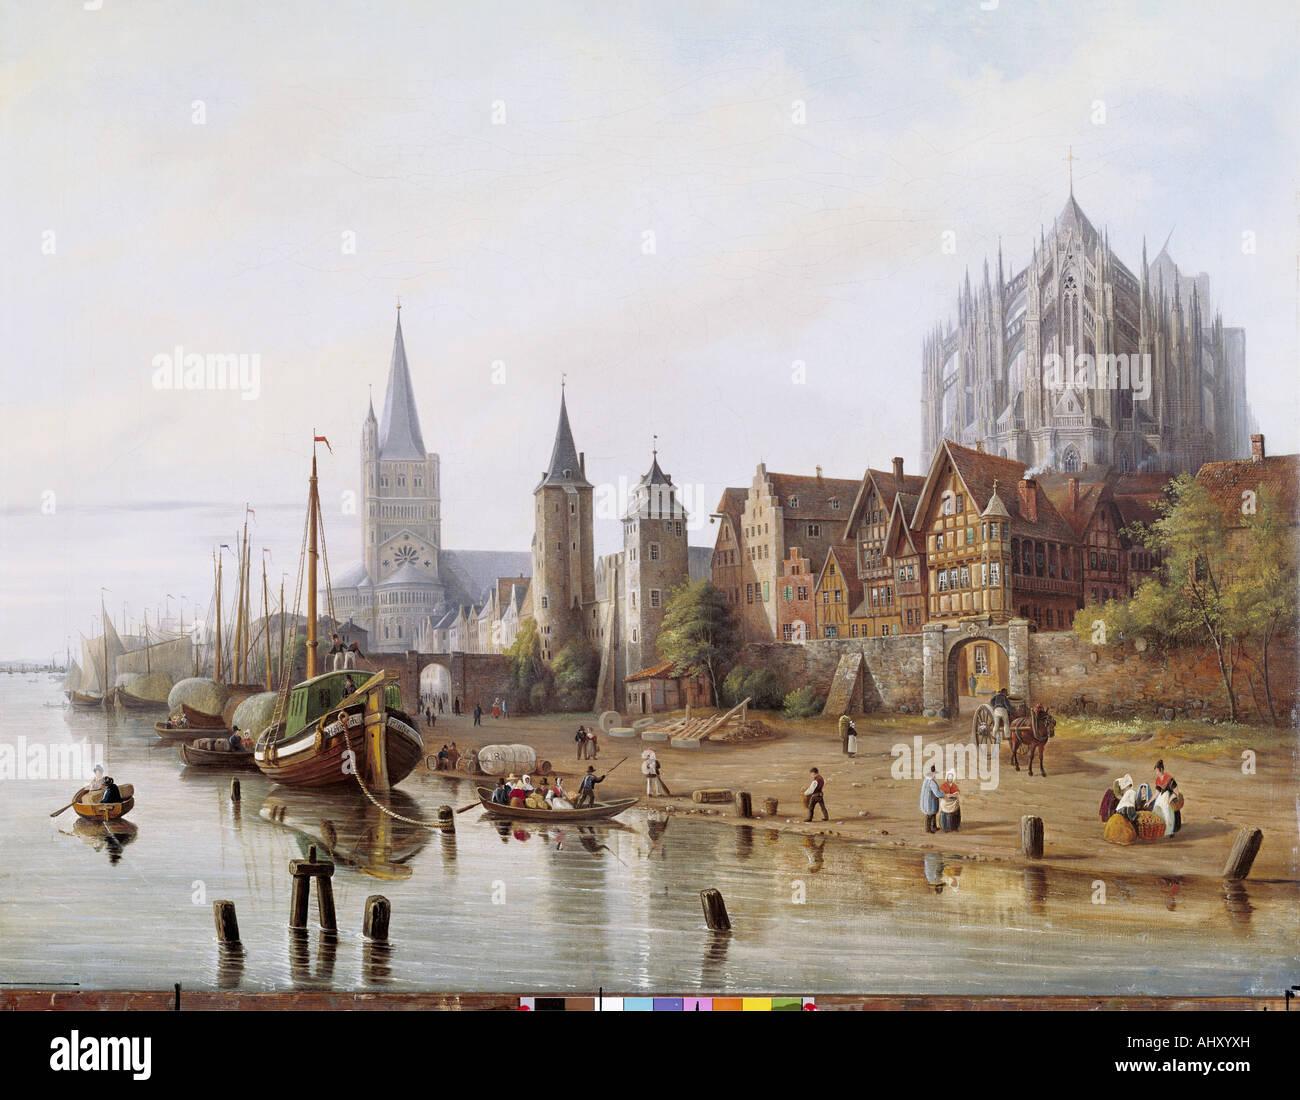 """Belle Arti, Hintze, Johann Heinrich, (1800 - 1862), pittura, 'Rheinufer bei Köln' ('banca Immagini Stock"